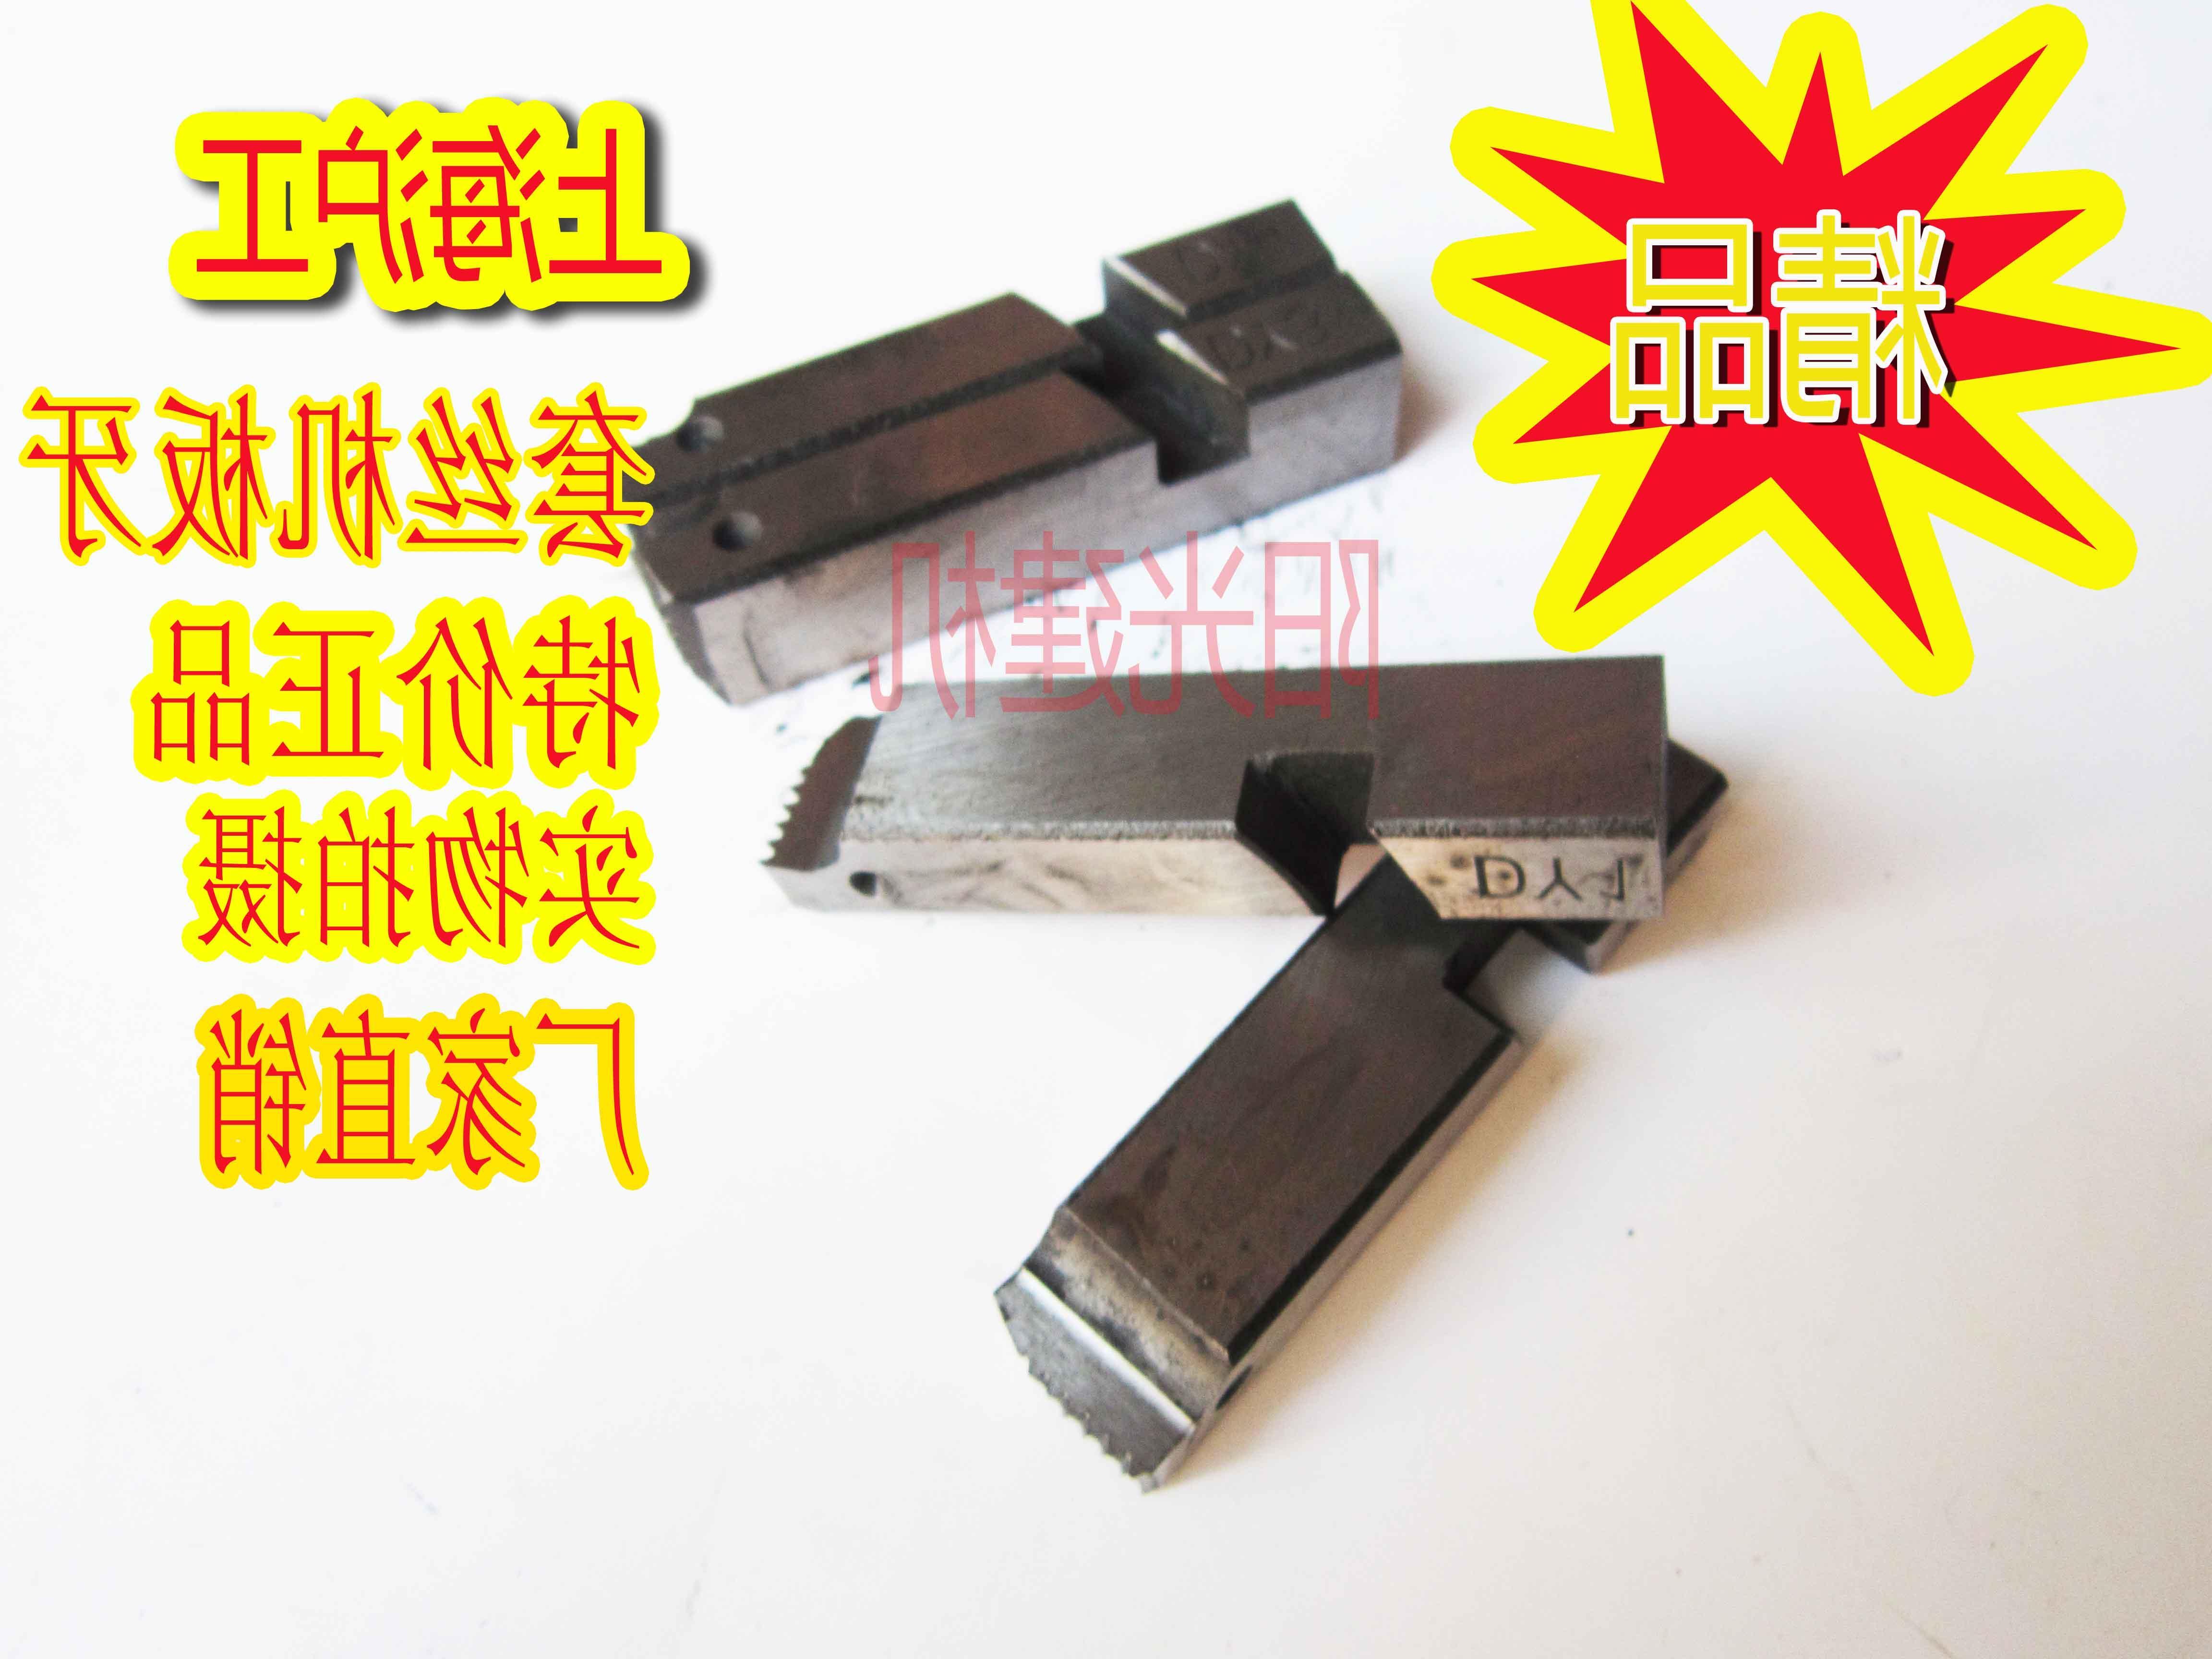 Shipping card original authentic electric threading machine screw tap die 2 inch 3 Inch 4 inch machine die